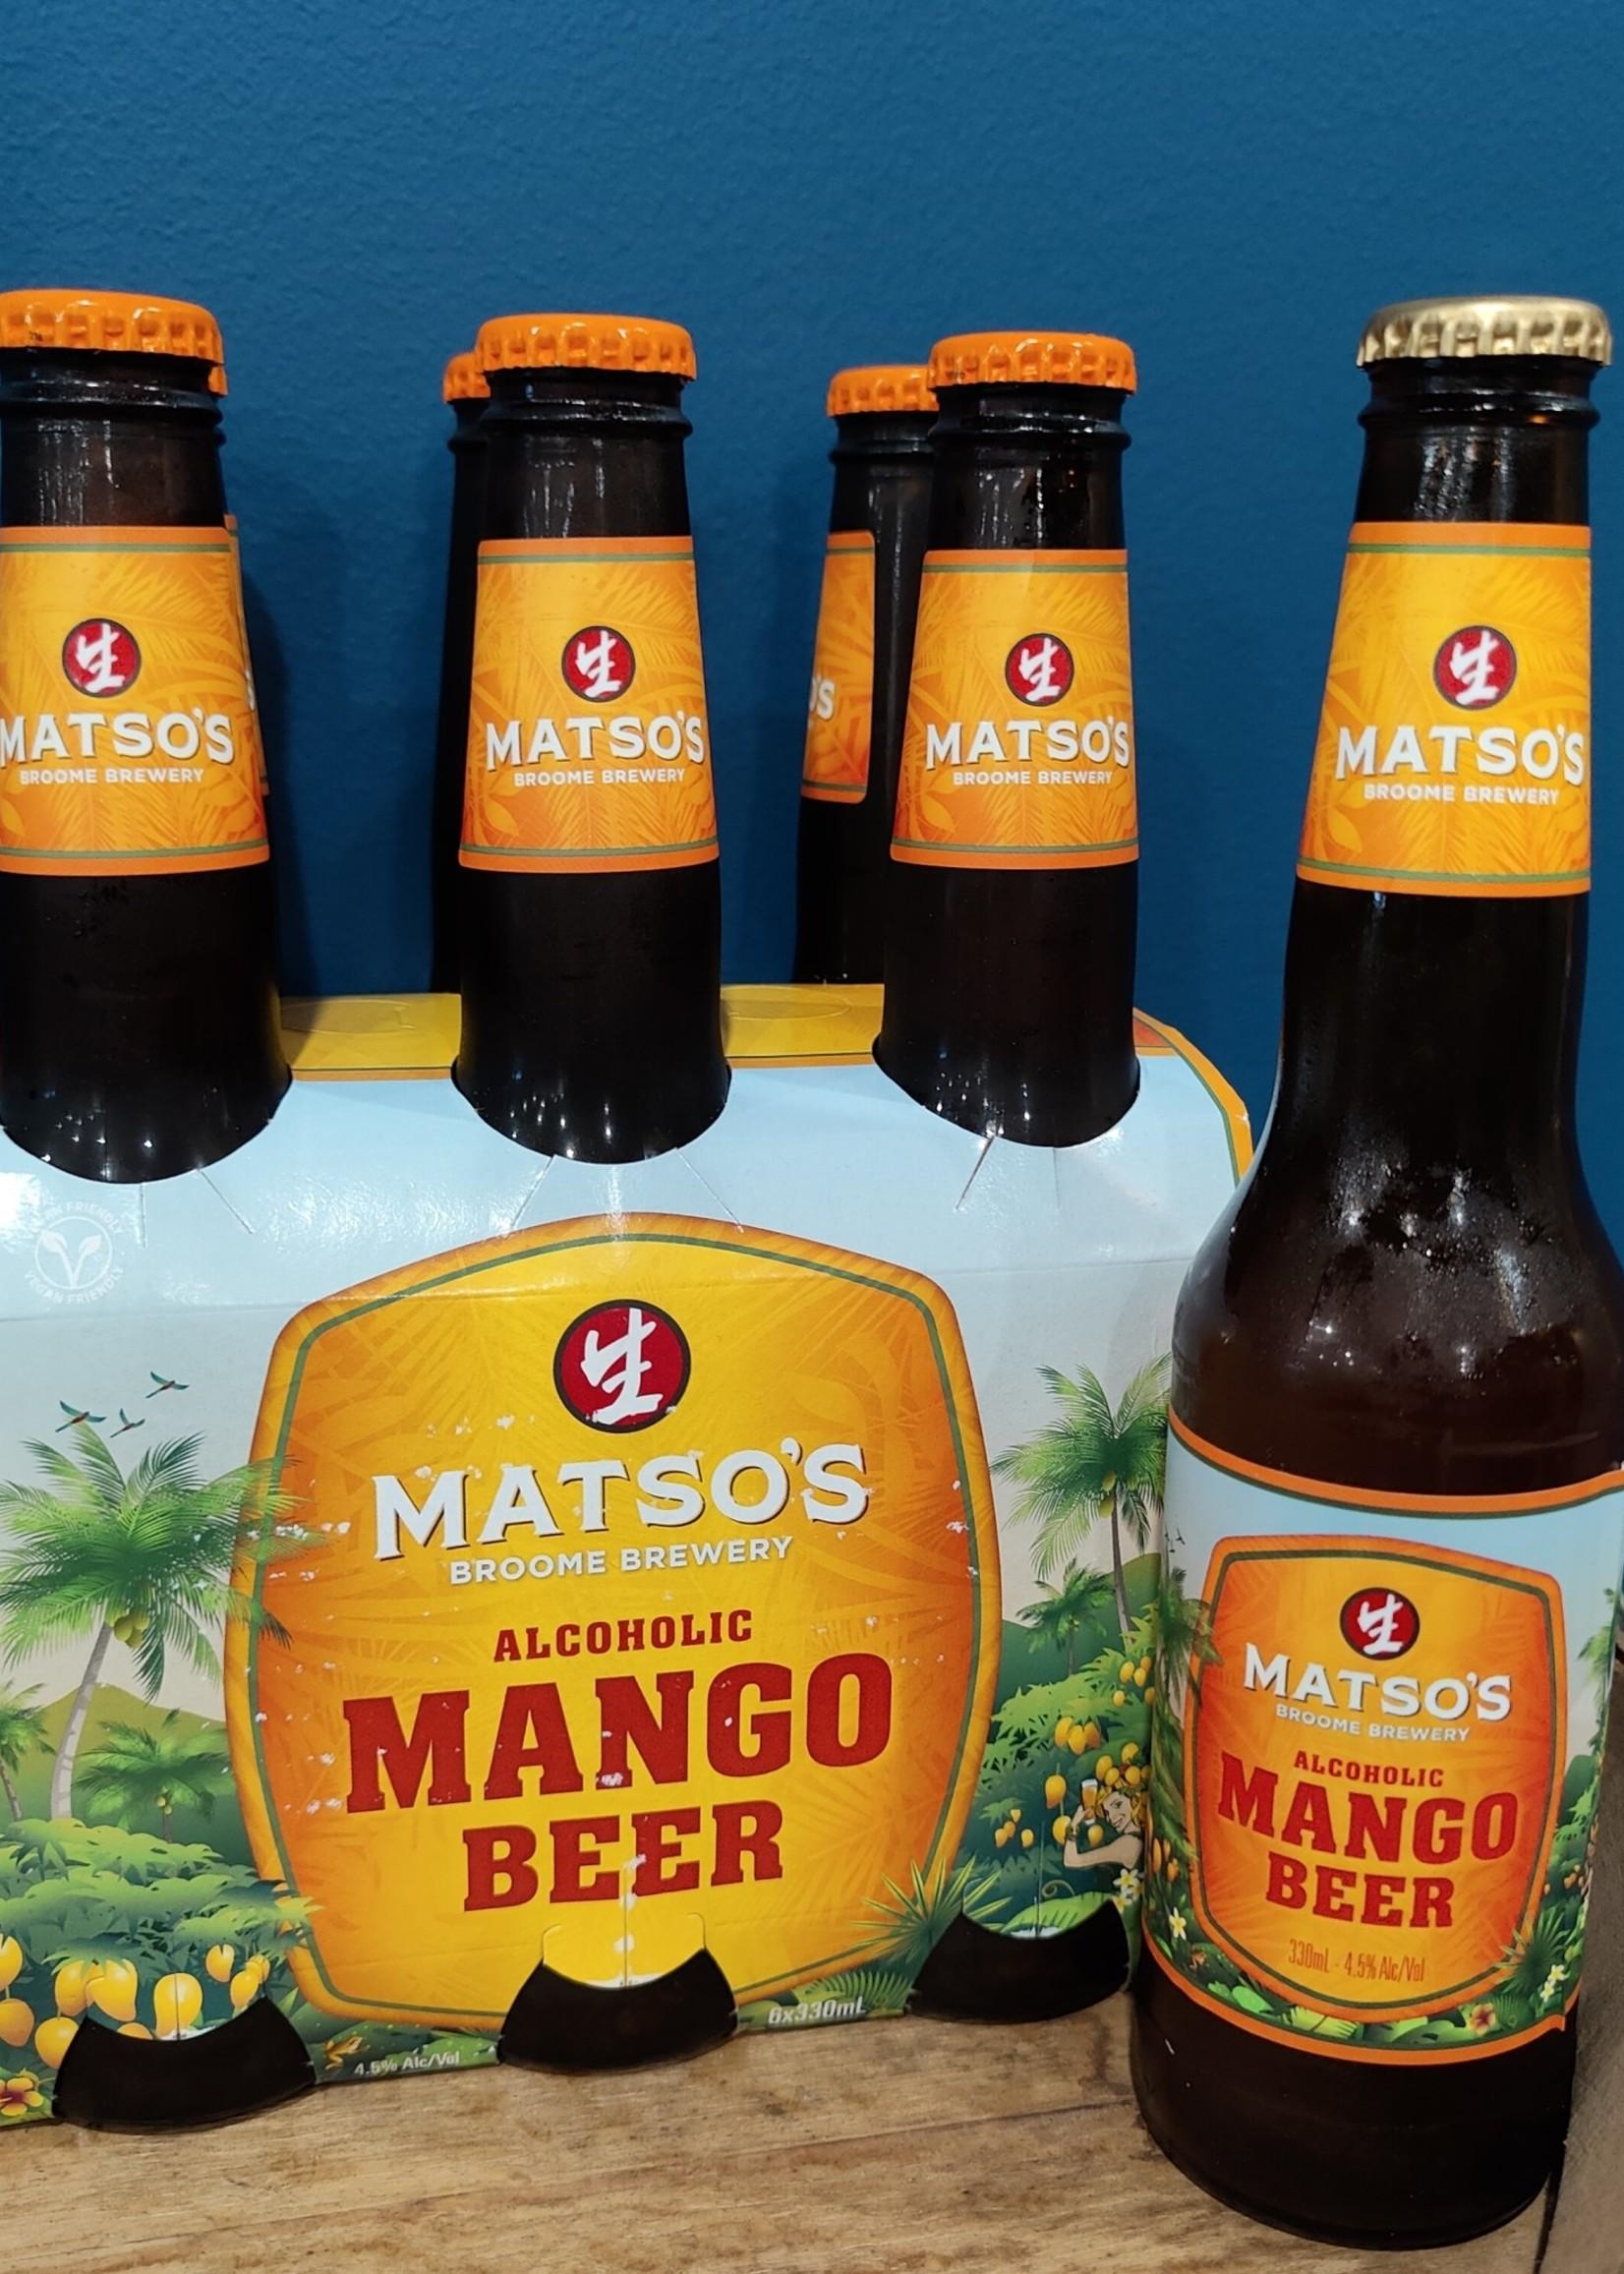 Matso's Matso's Mango Beer